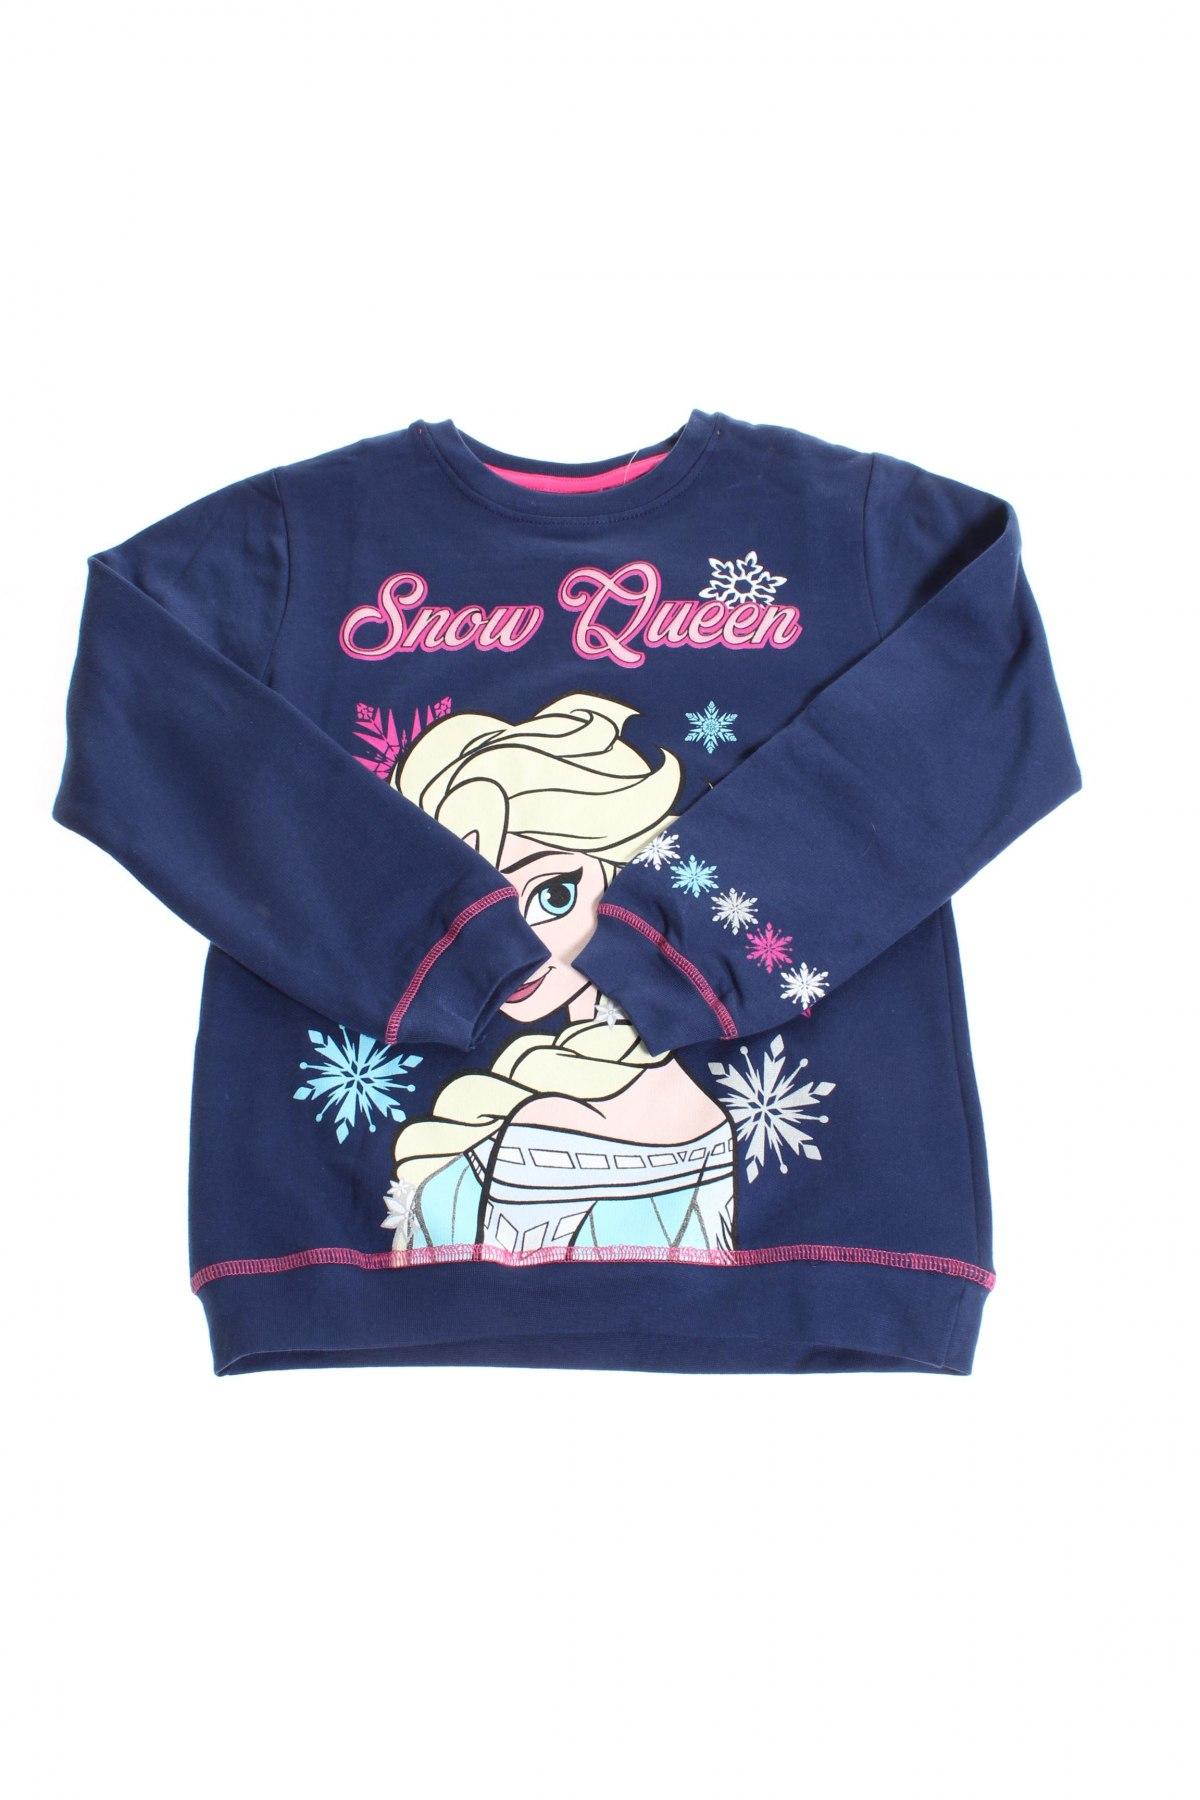 bd53bba8b3c9 Παιδική μπλούζα Disney - σε συμφέρουσα τιμή στο Remix -  103307637